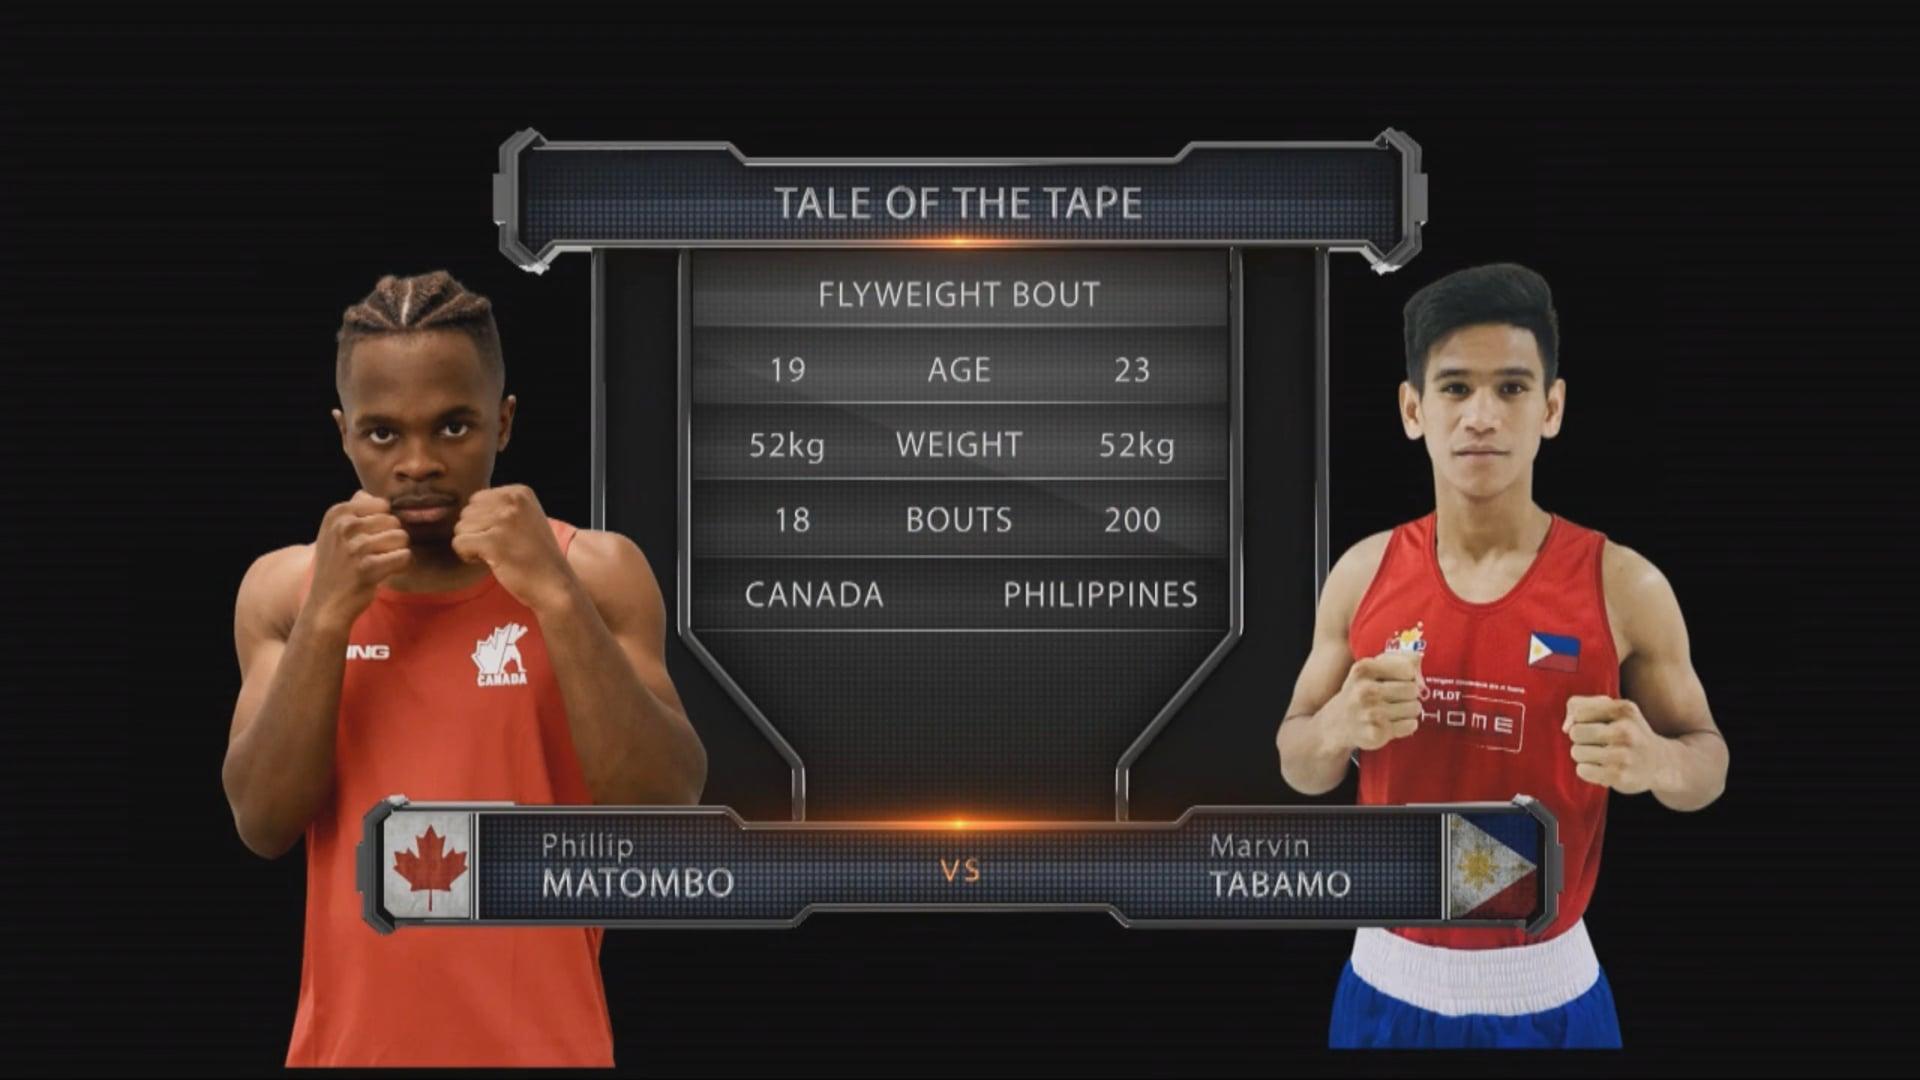 Phillip Matombo (CAN) vs Marvin Tabamo (PHL)